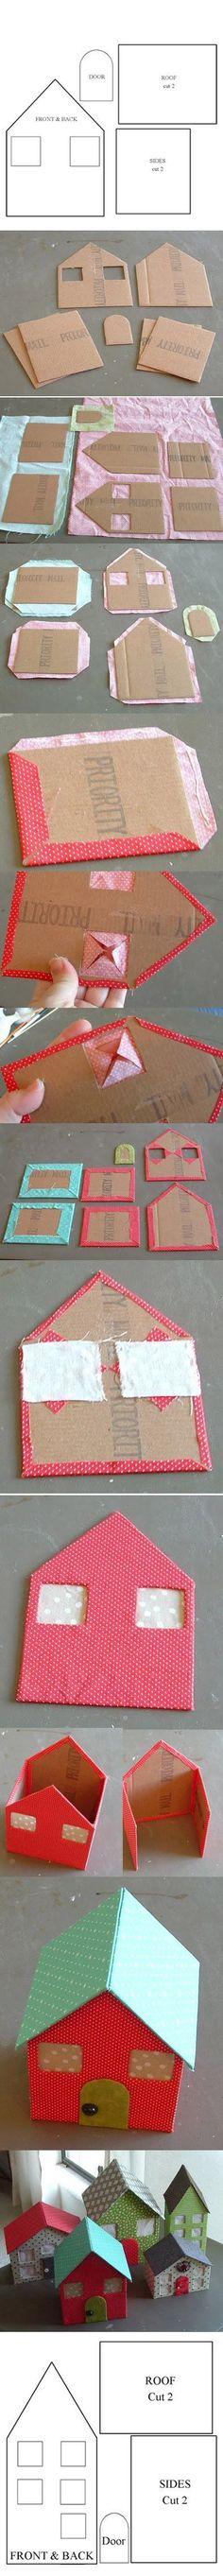 DIY Little Cardboard Houses -thecartbeforethehorse.blogspot.com